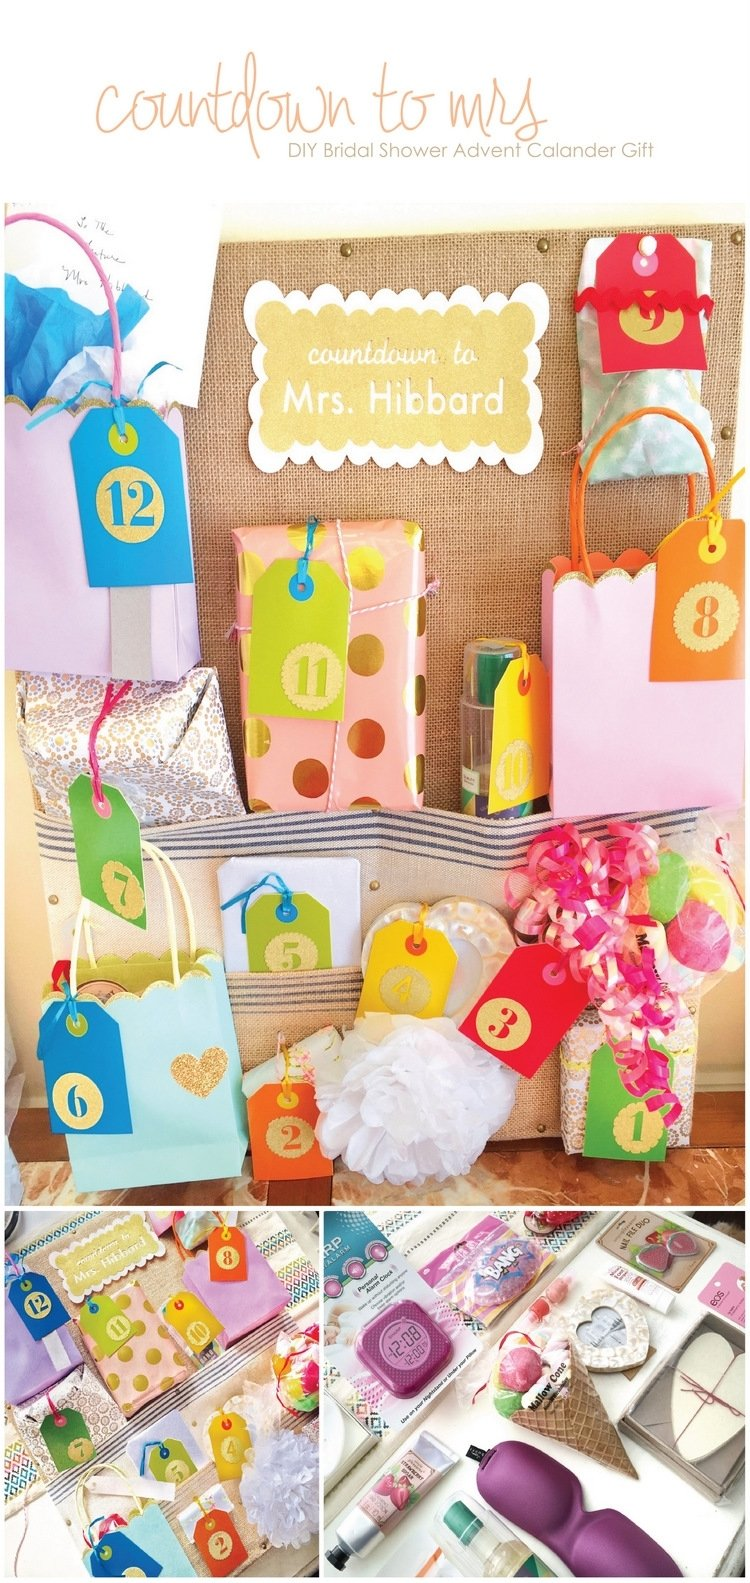 10 Trendy Ideas For Advent Calendar Gifts diy bridal shower advent calendar